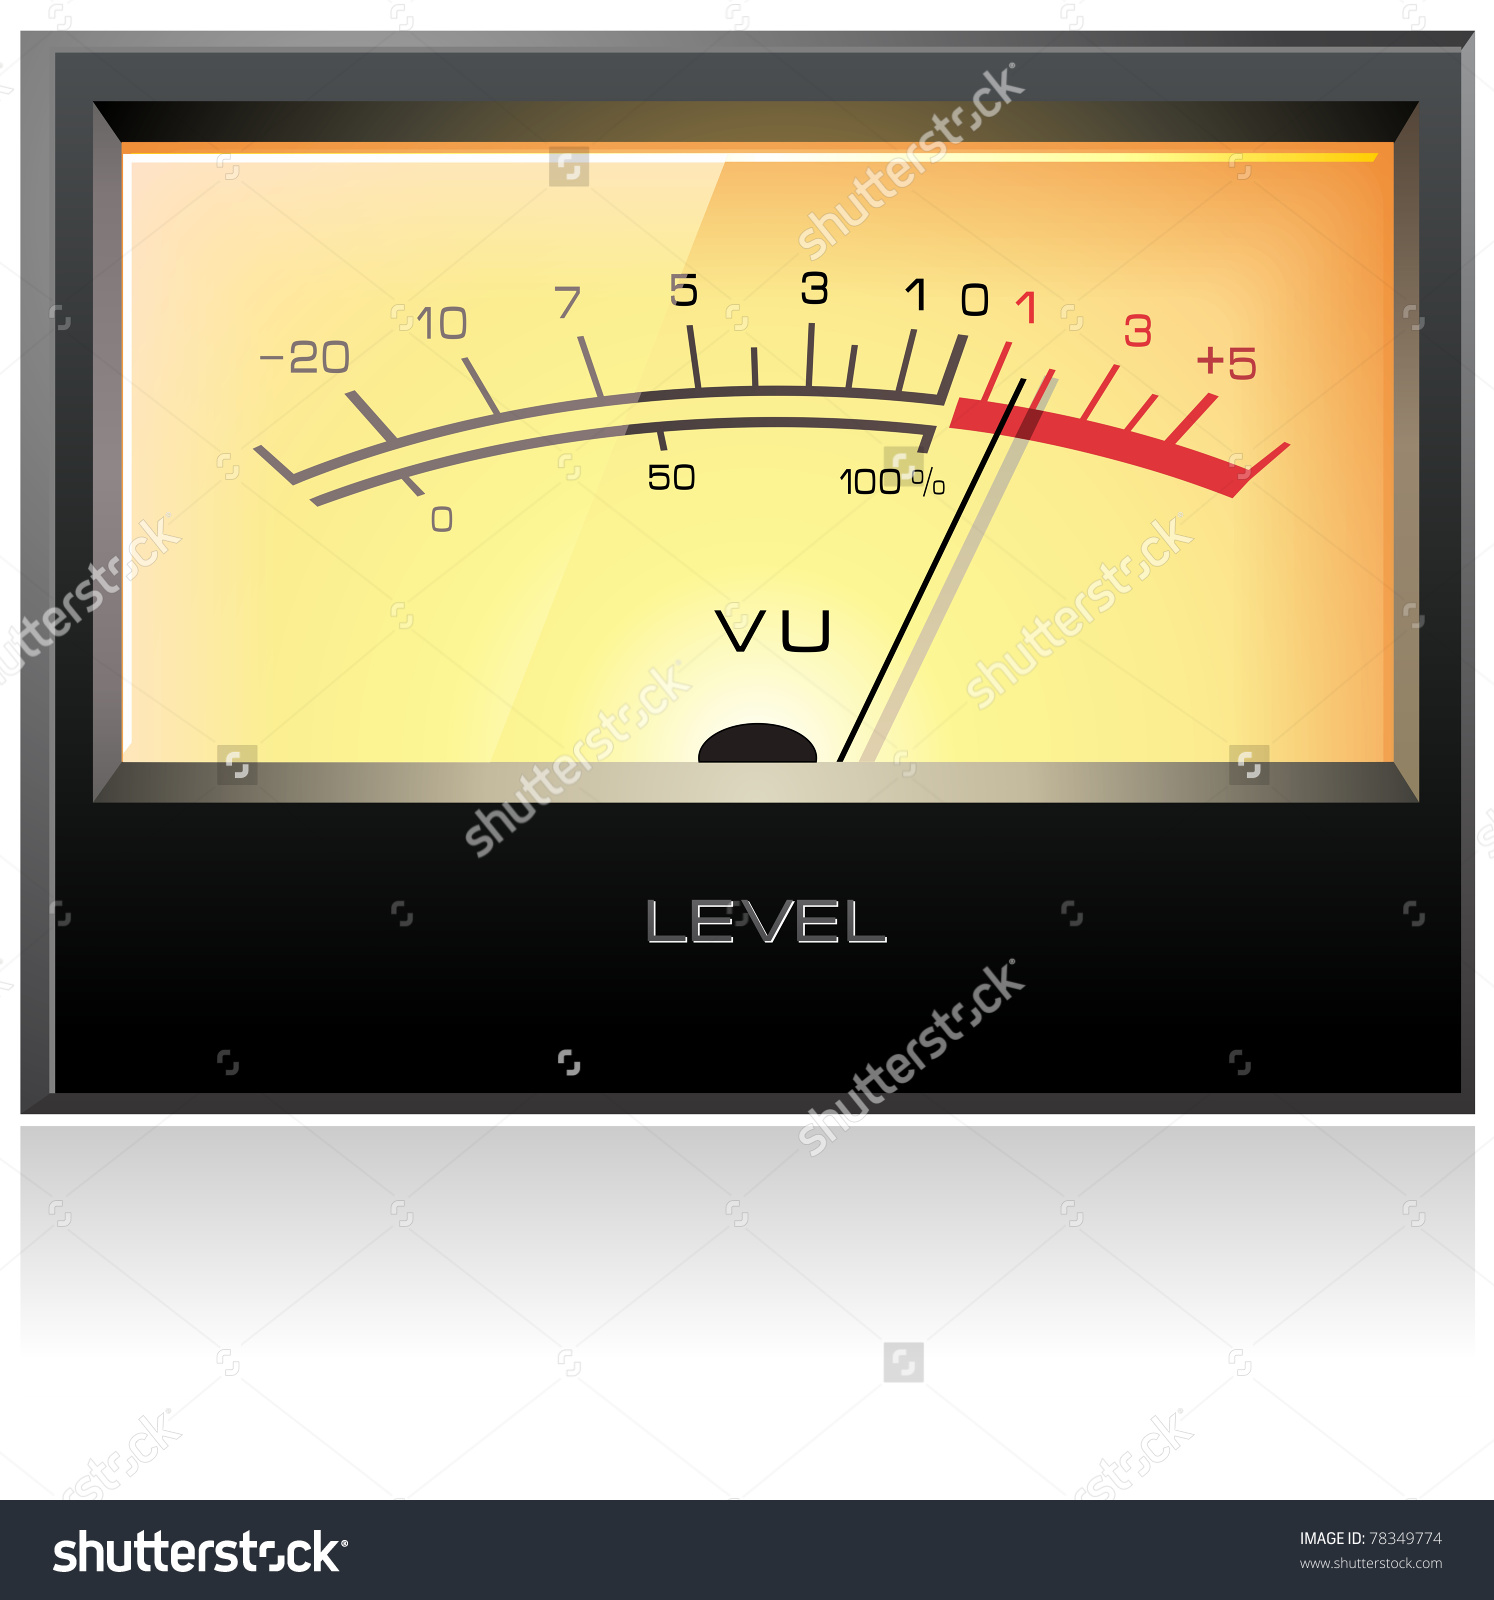 Analog Electronic Vu Meter, Detailed Vector.